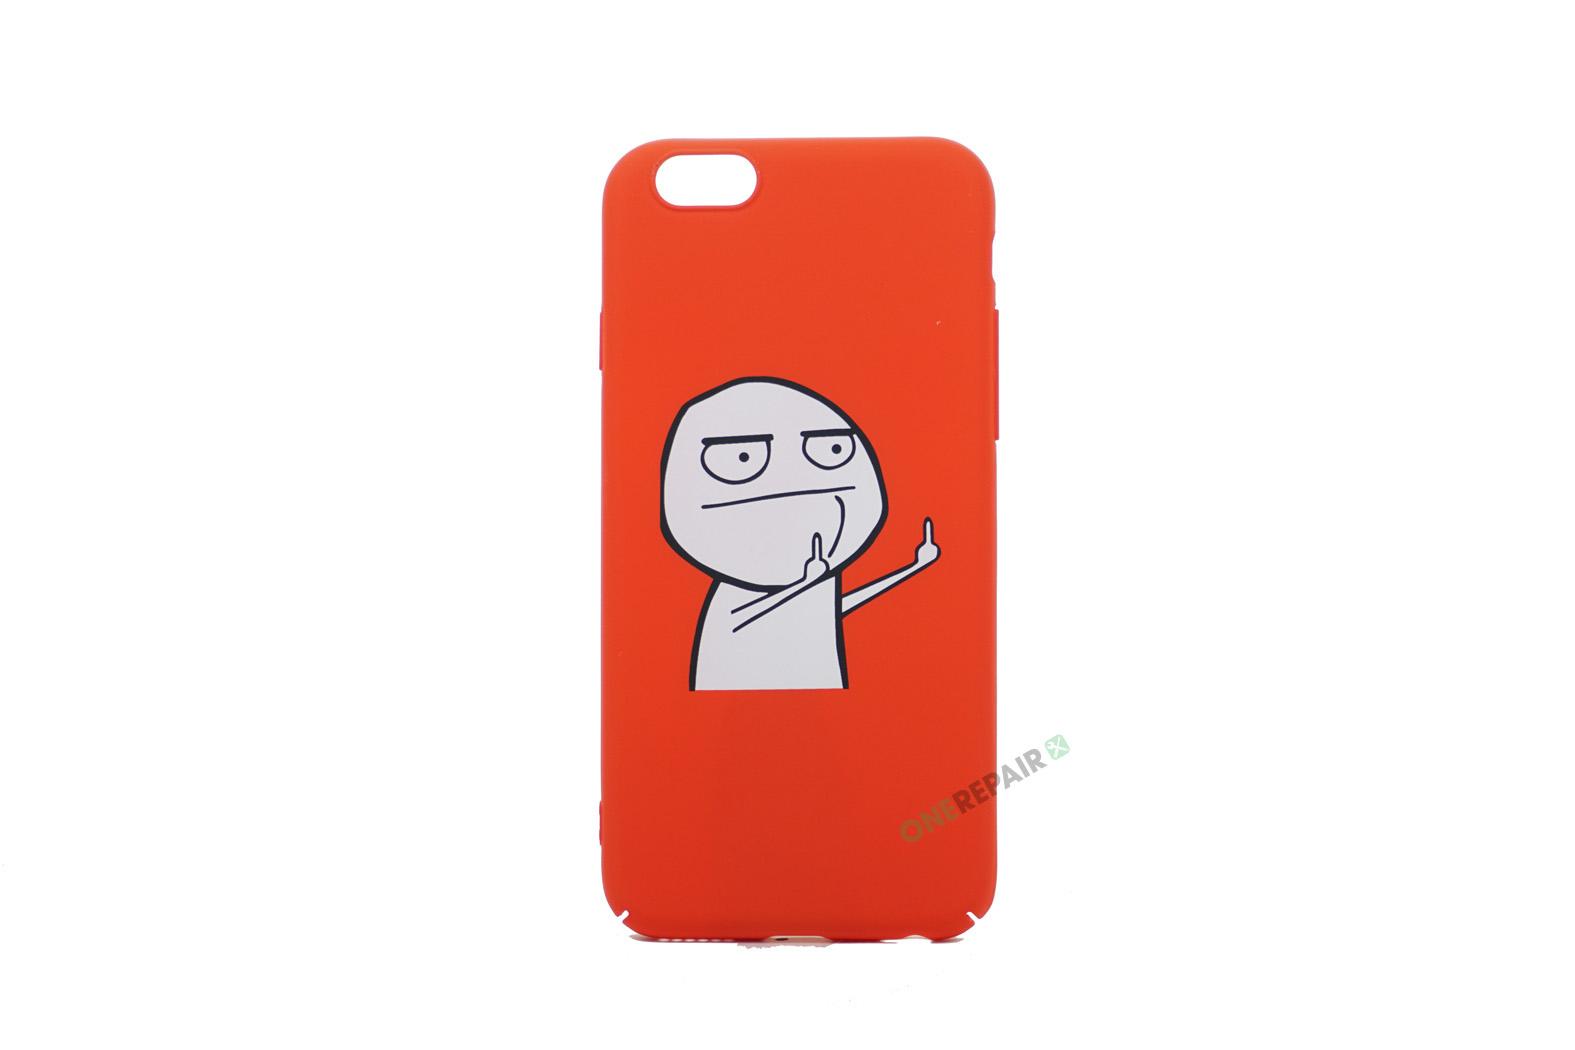 iPhone 6, 6S, A1549, A1586, A1589, A1633, A1688, A1700, A1691, Apple, Bagcover, Cover, Billig, Motiv, Finger, Meme, Roed, Rød, Sjov